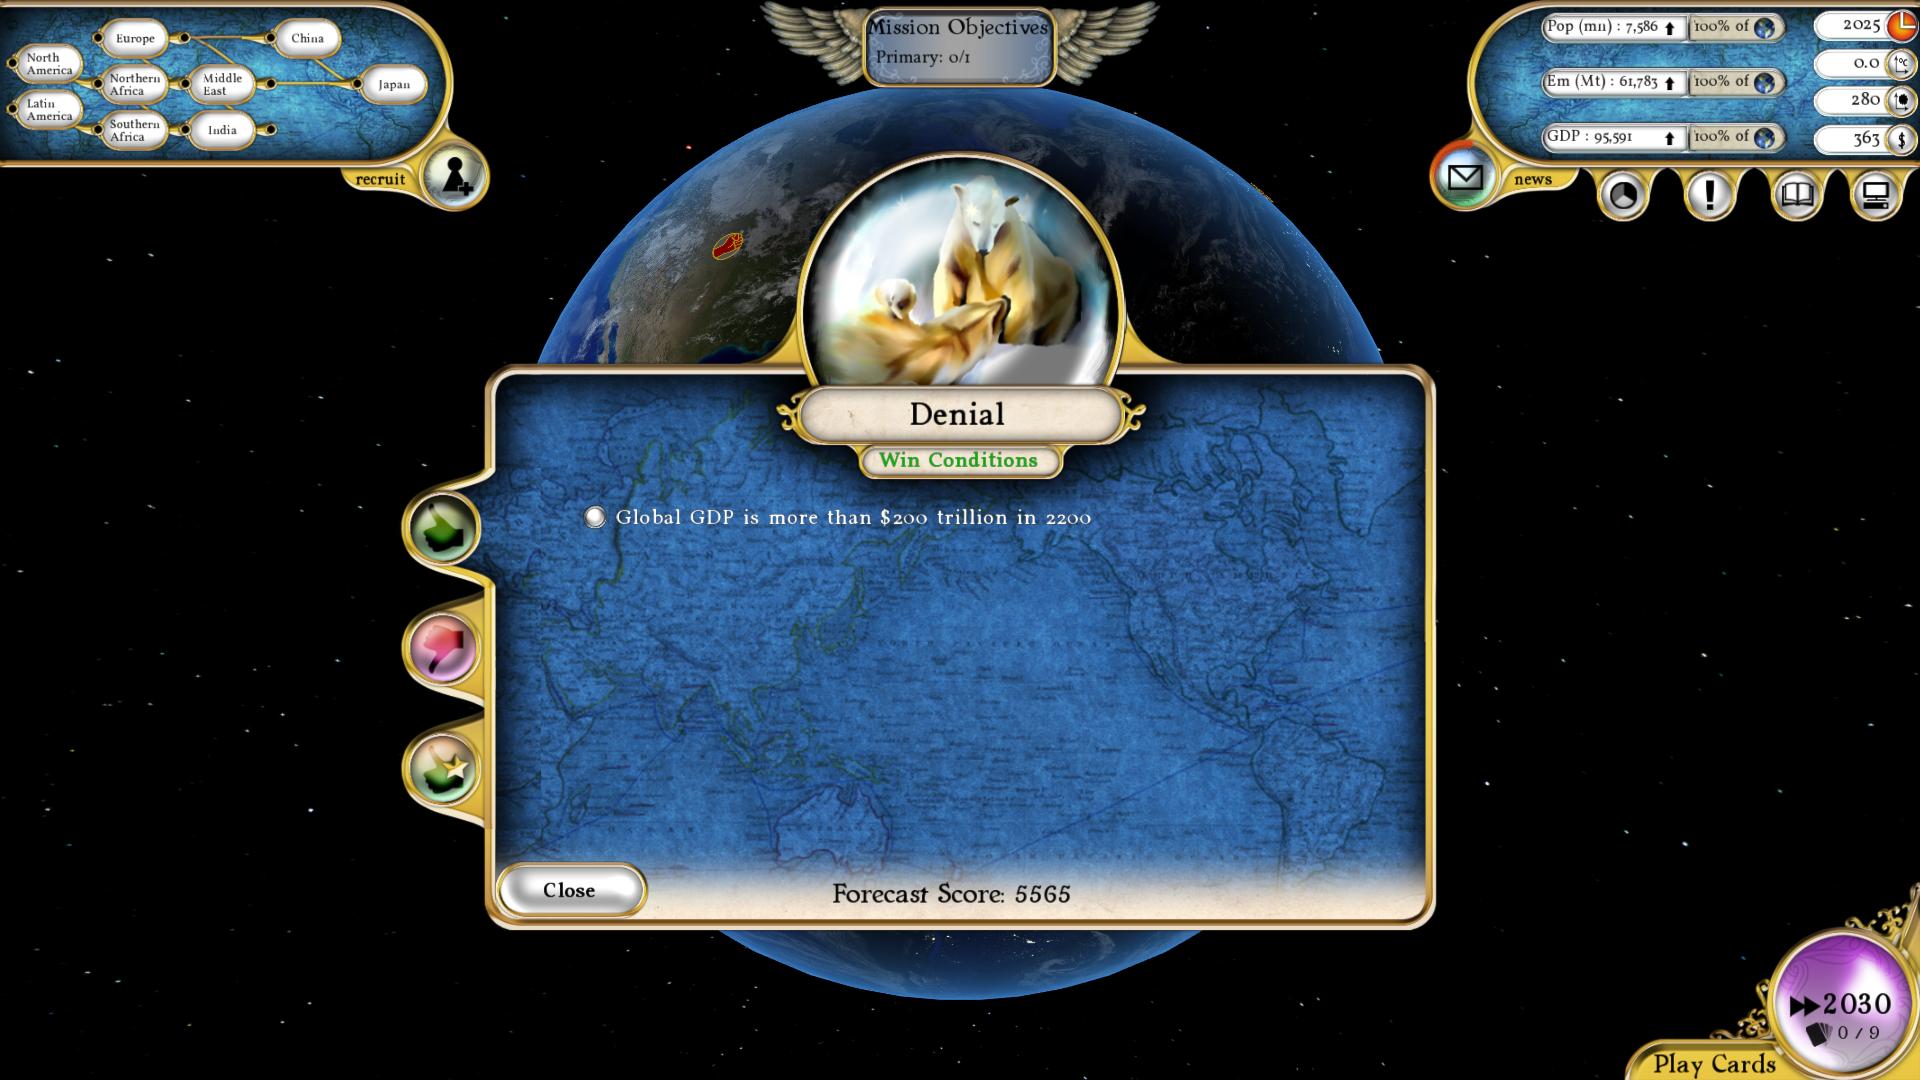 Fate of the World: Denial screenshot